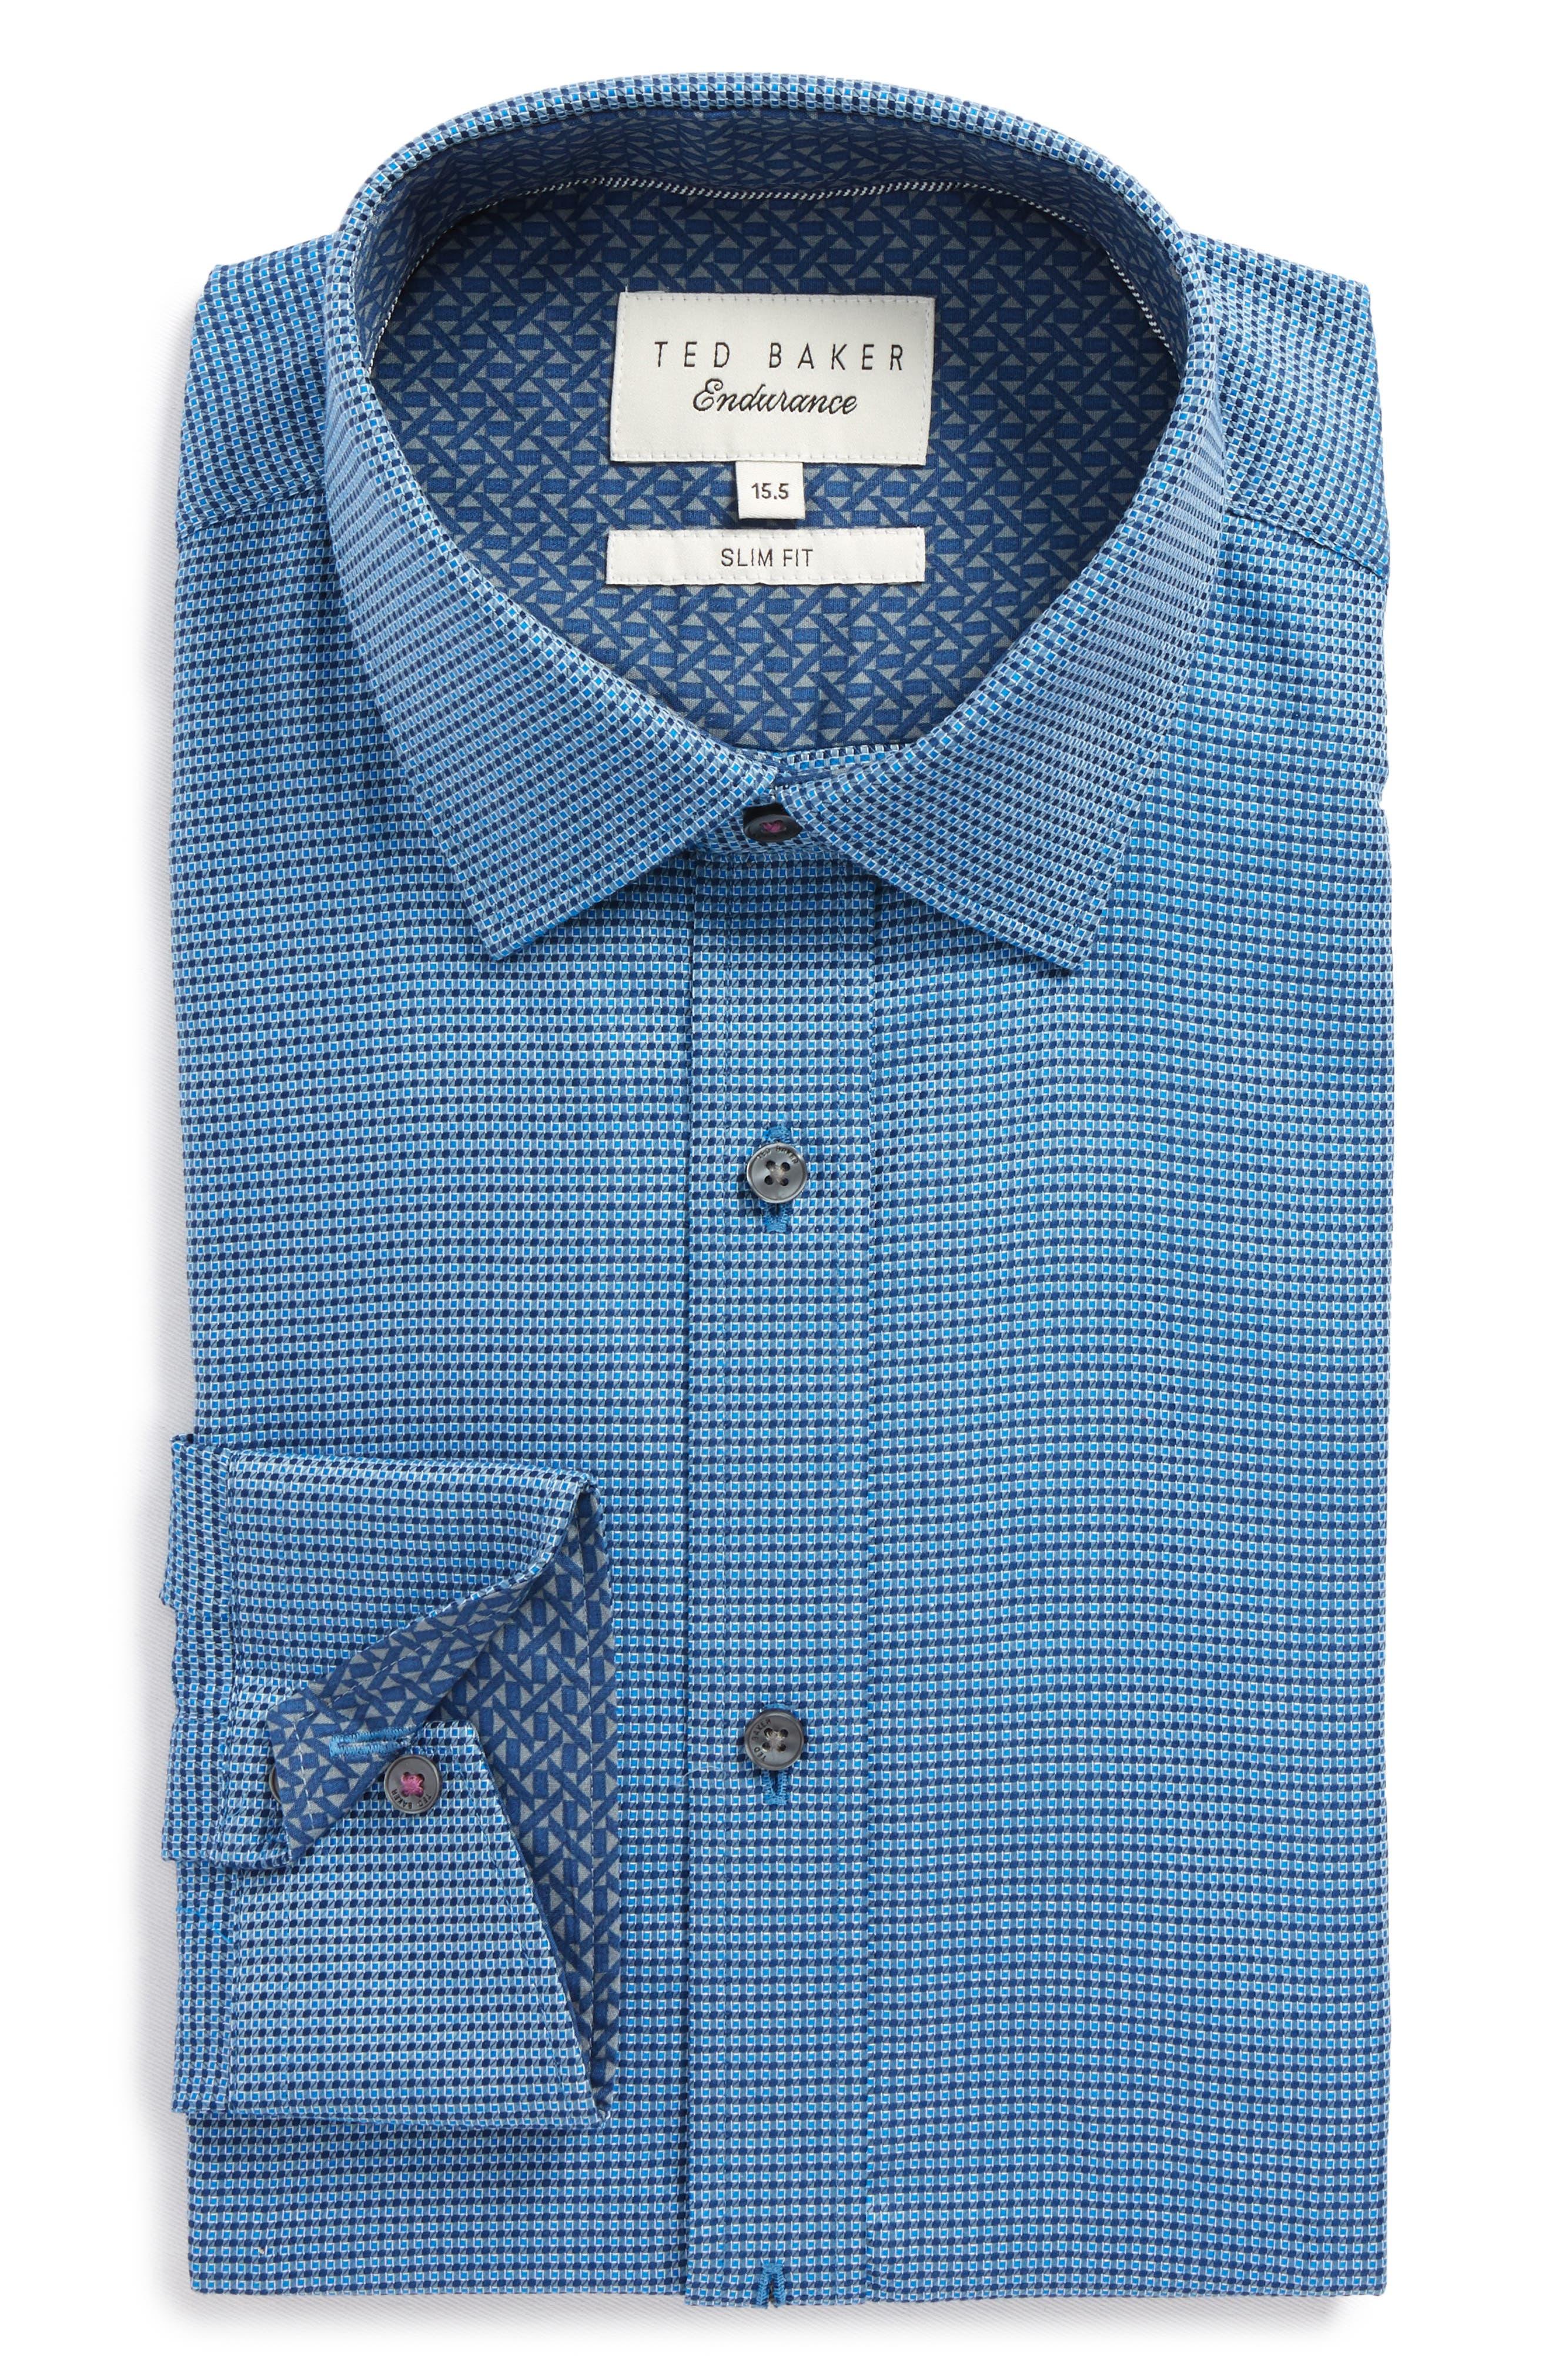 TED BAKER LONDON Endurance Slim Fit Box Twill Dress Shirt, Main, color, 410